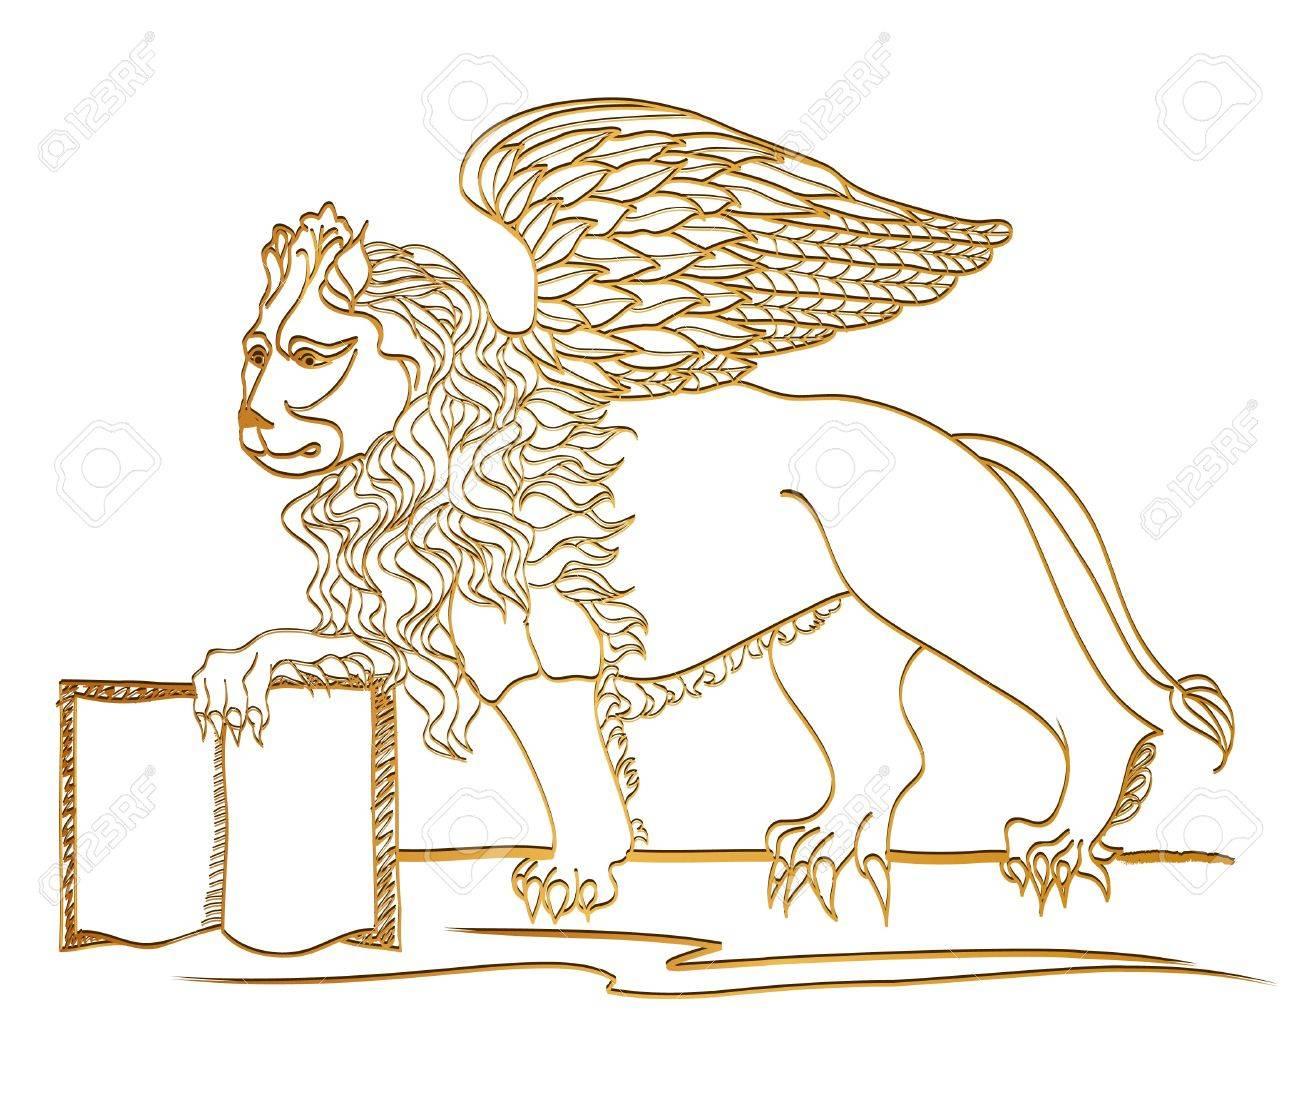 Winged Lion in  , golden sculpture, St  Mark symbol, Venice Stock Vector - 21321346